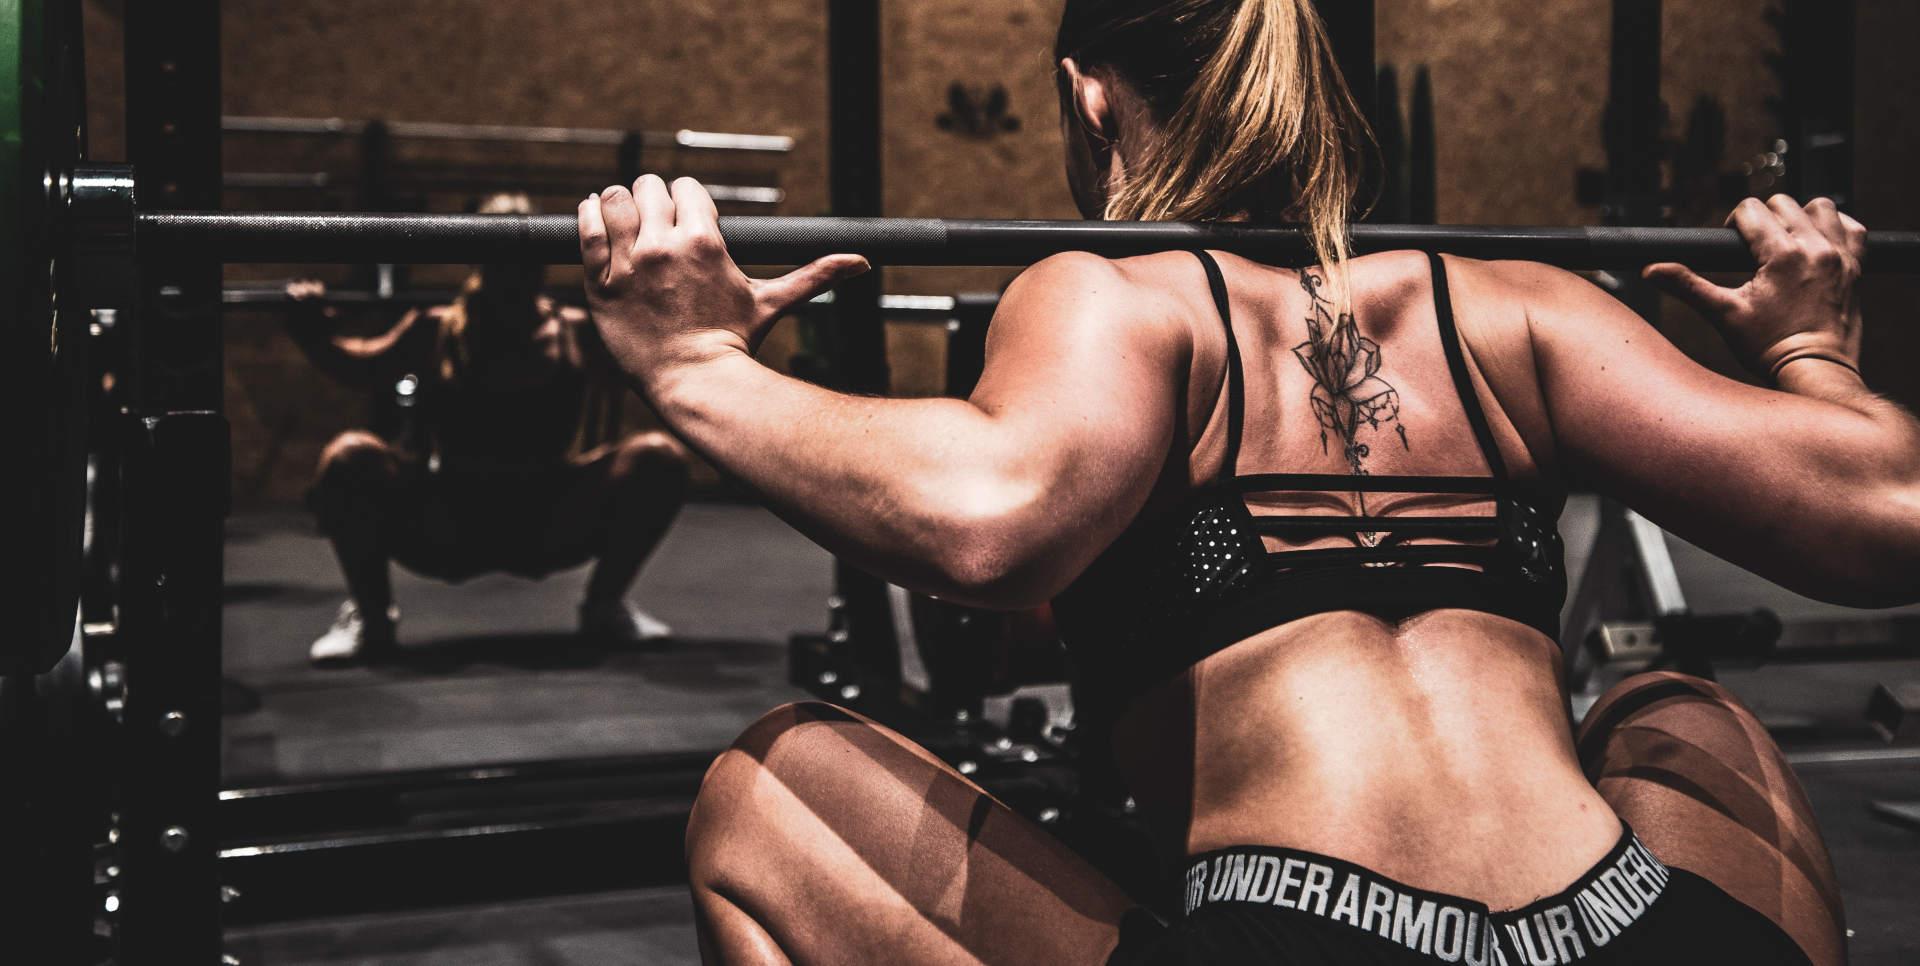 girl squatting fitness gym